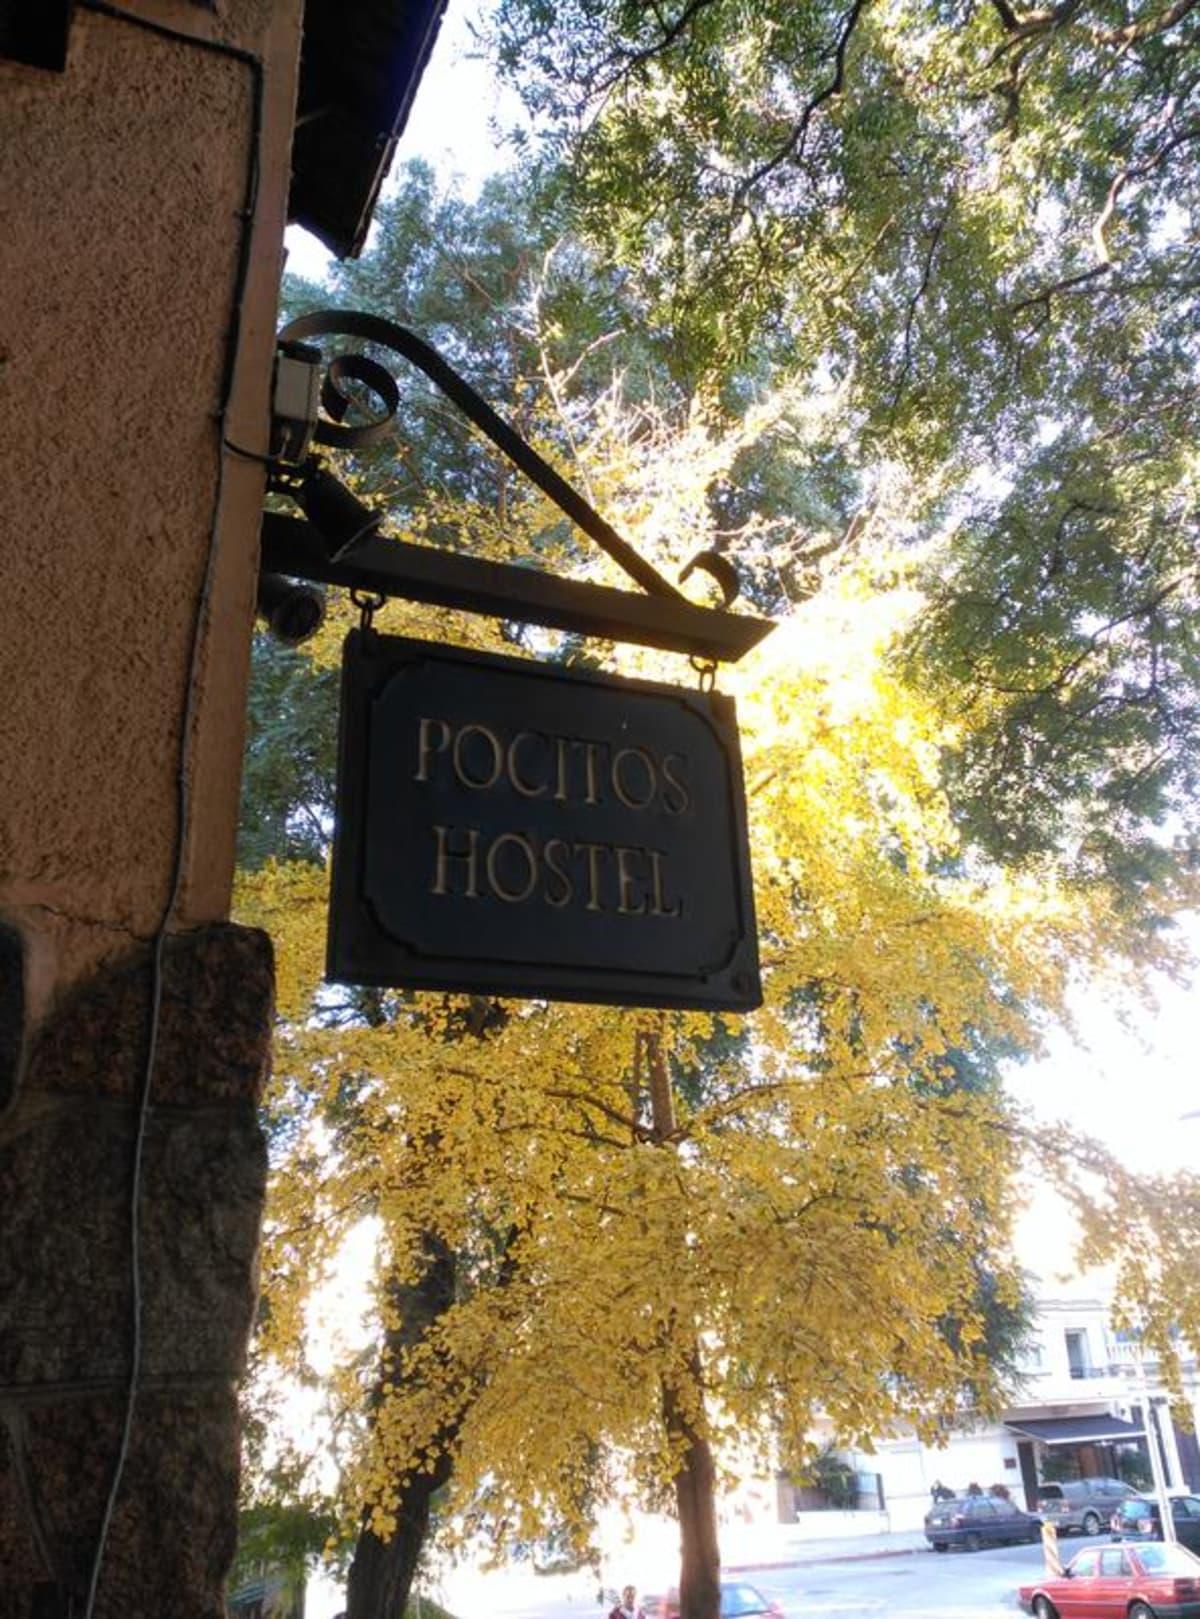 Pocitos Hostel, Montevideo, Uruguay hostel